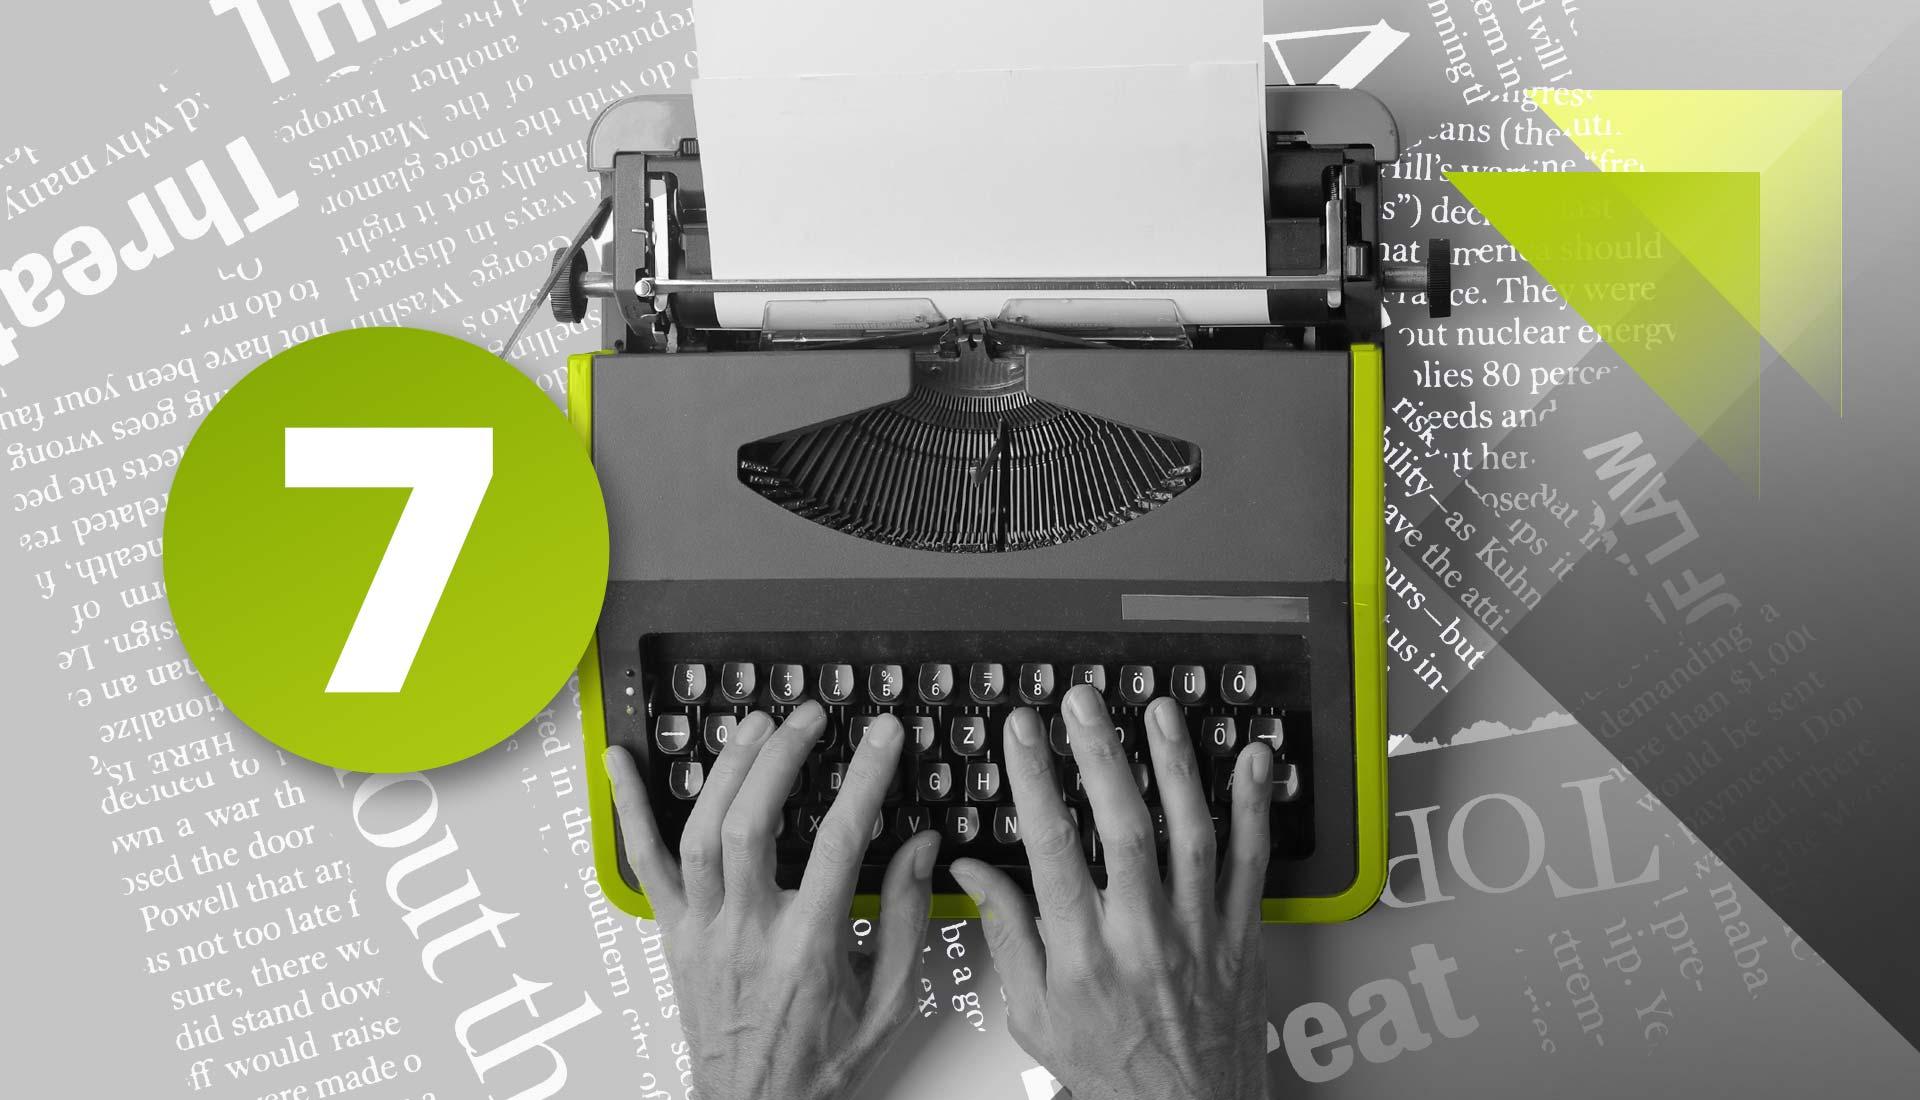 Seven blogging tips for business